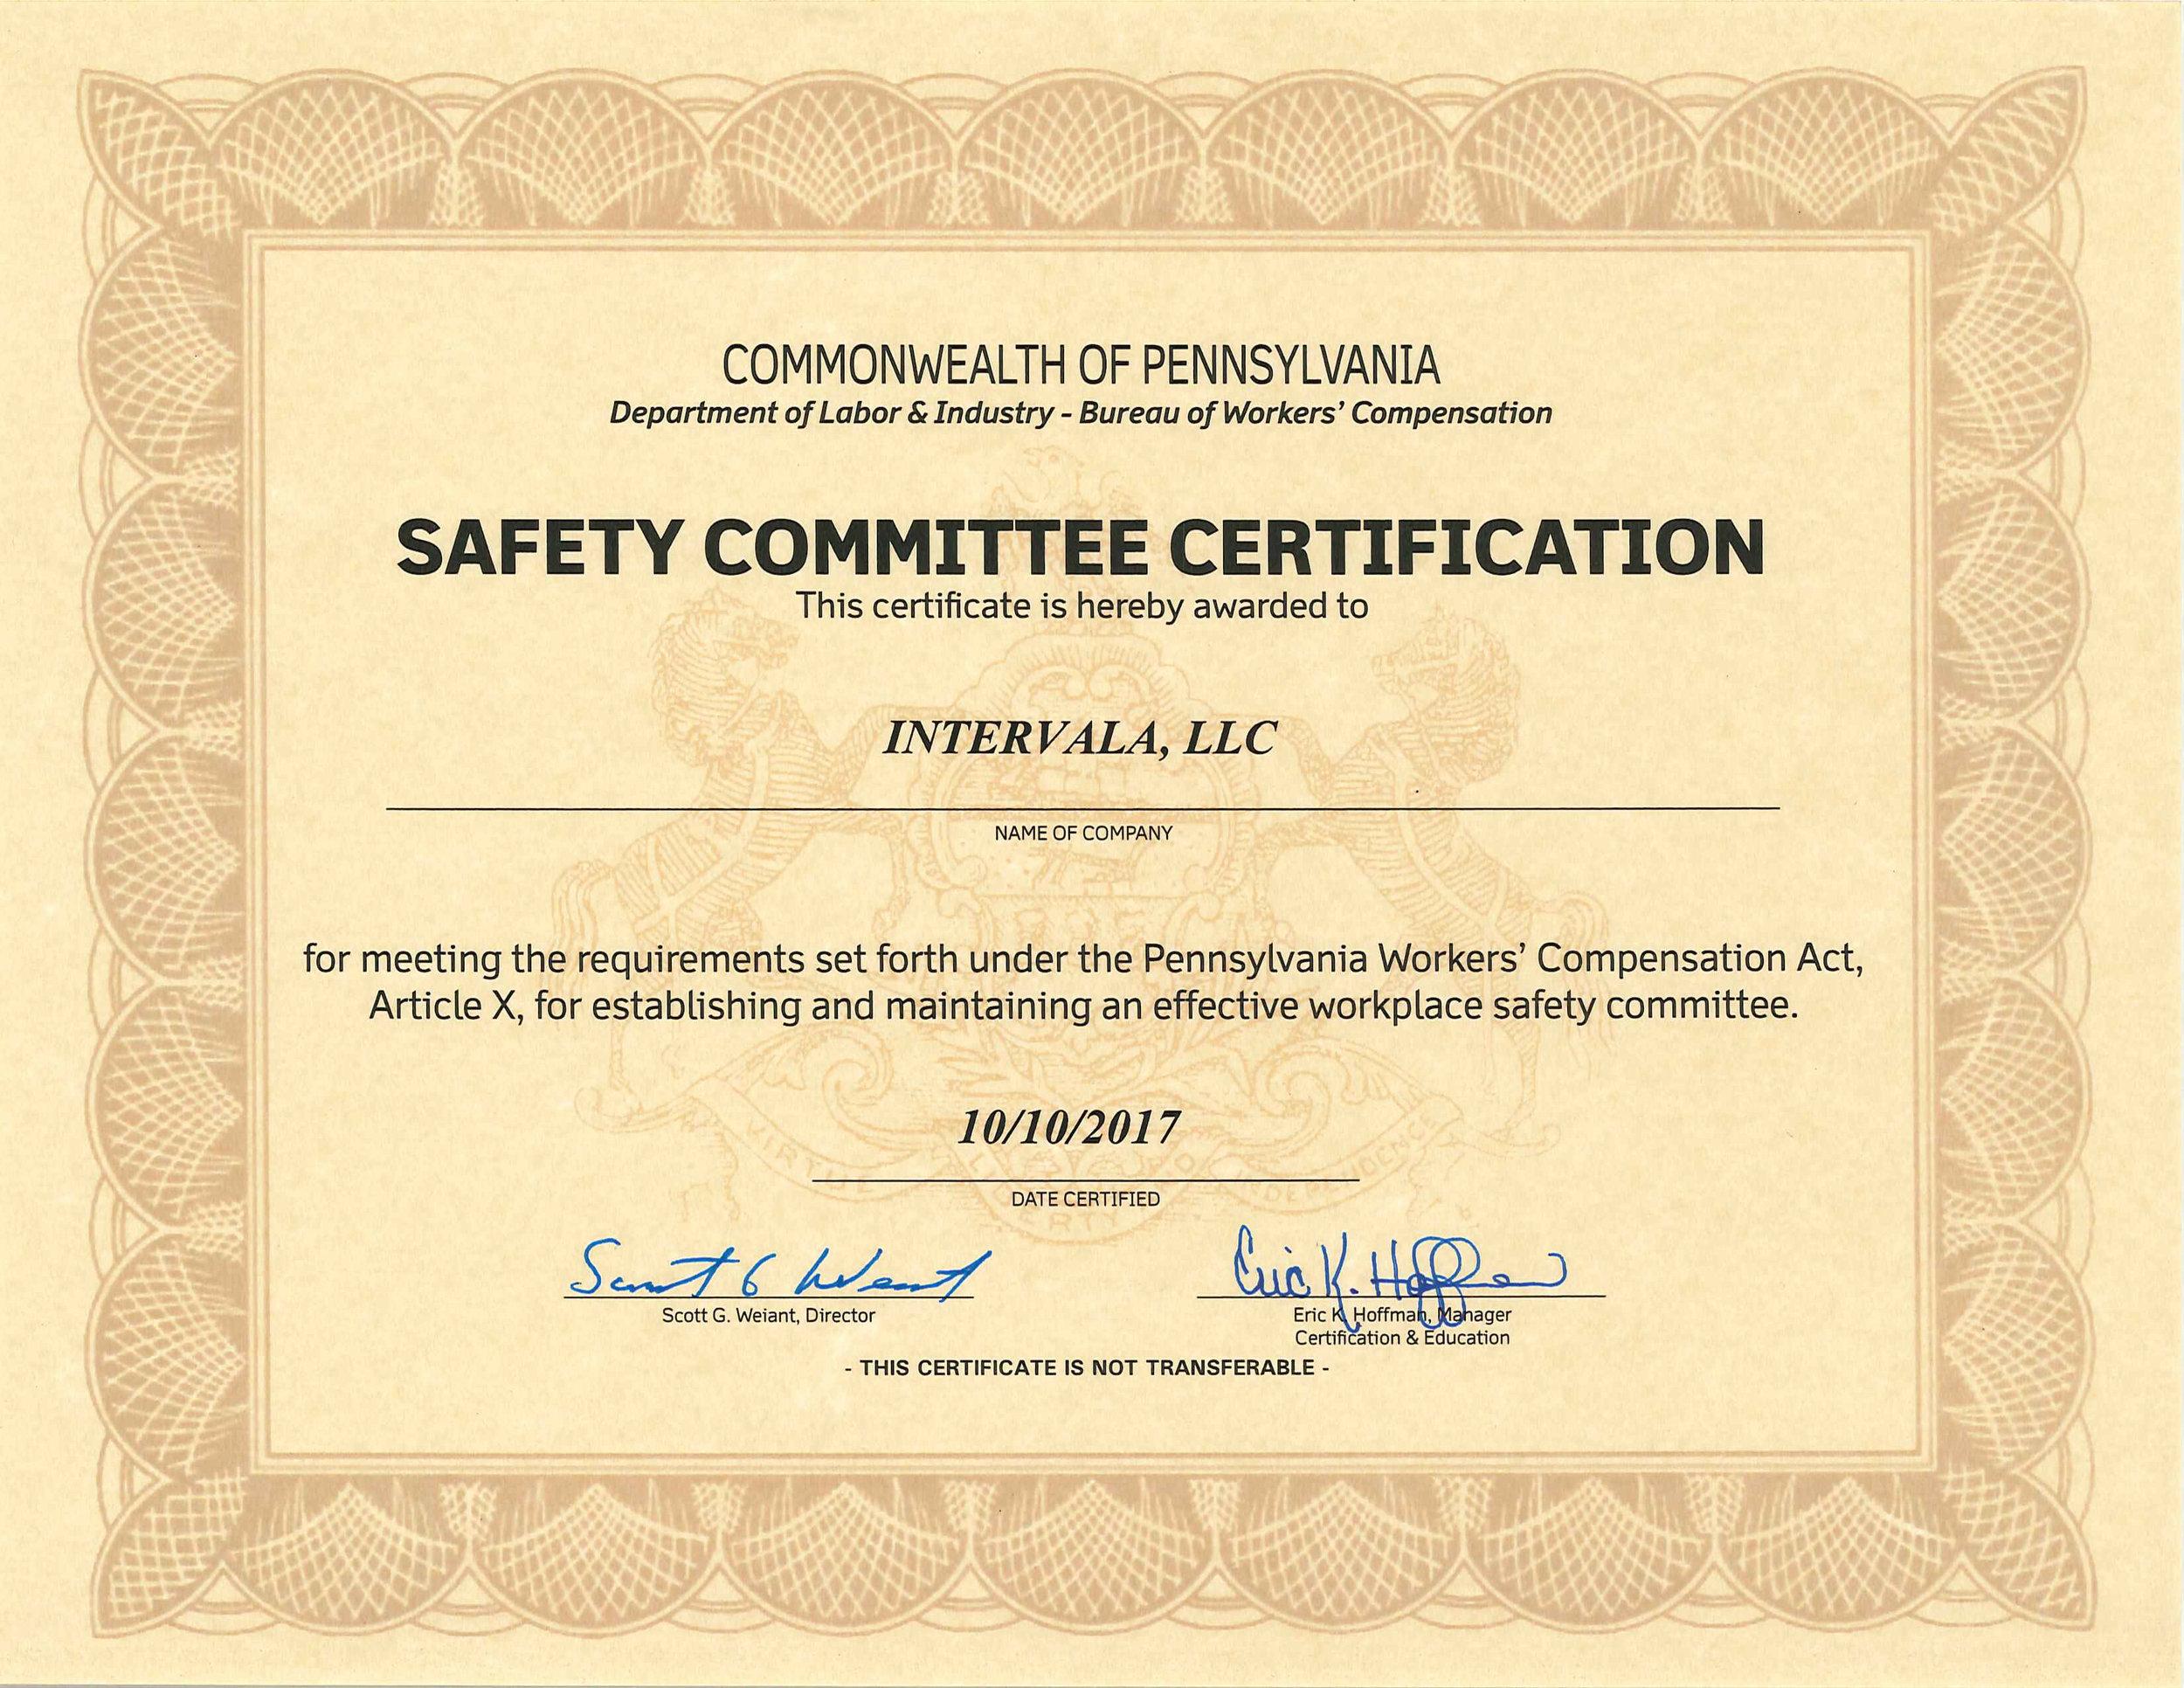 SafetyCertificate.jpg